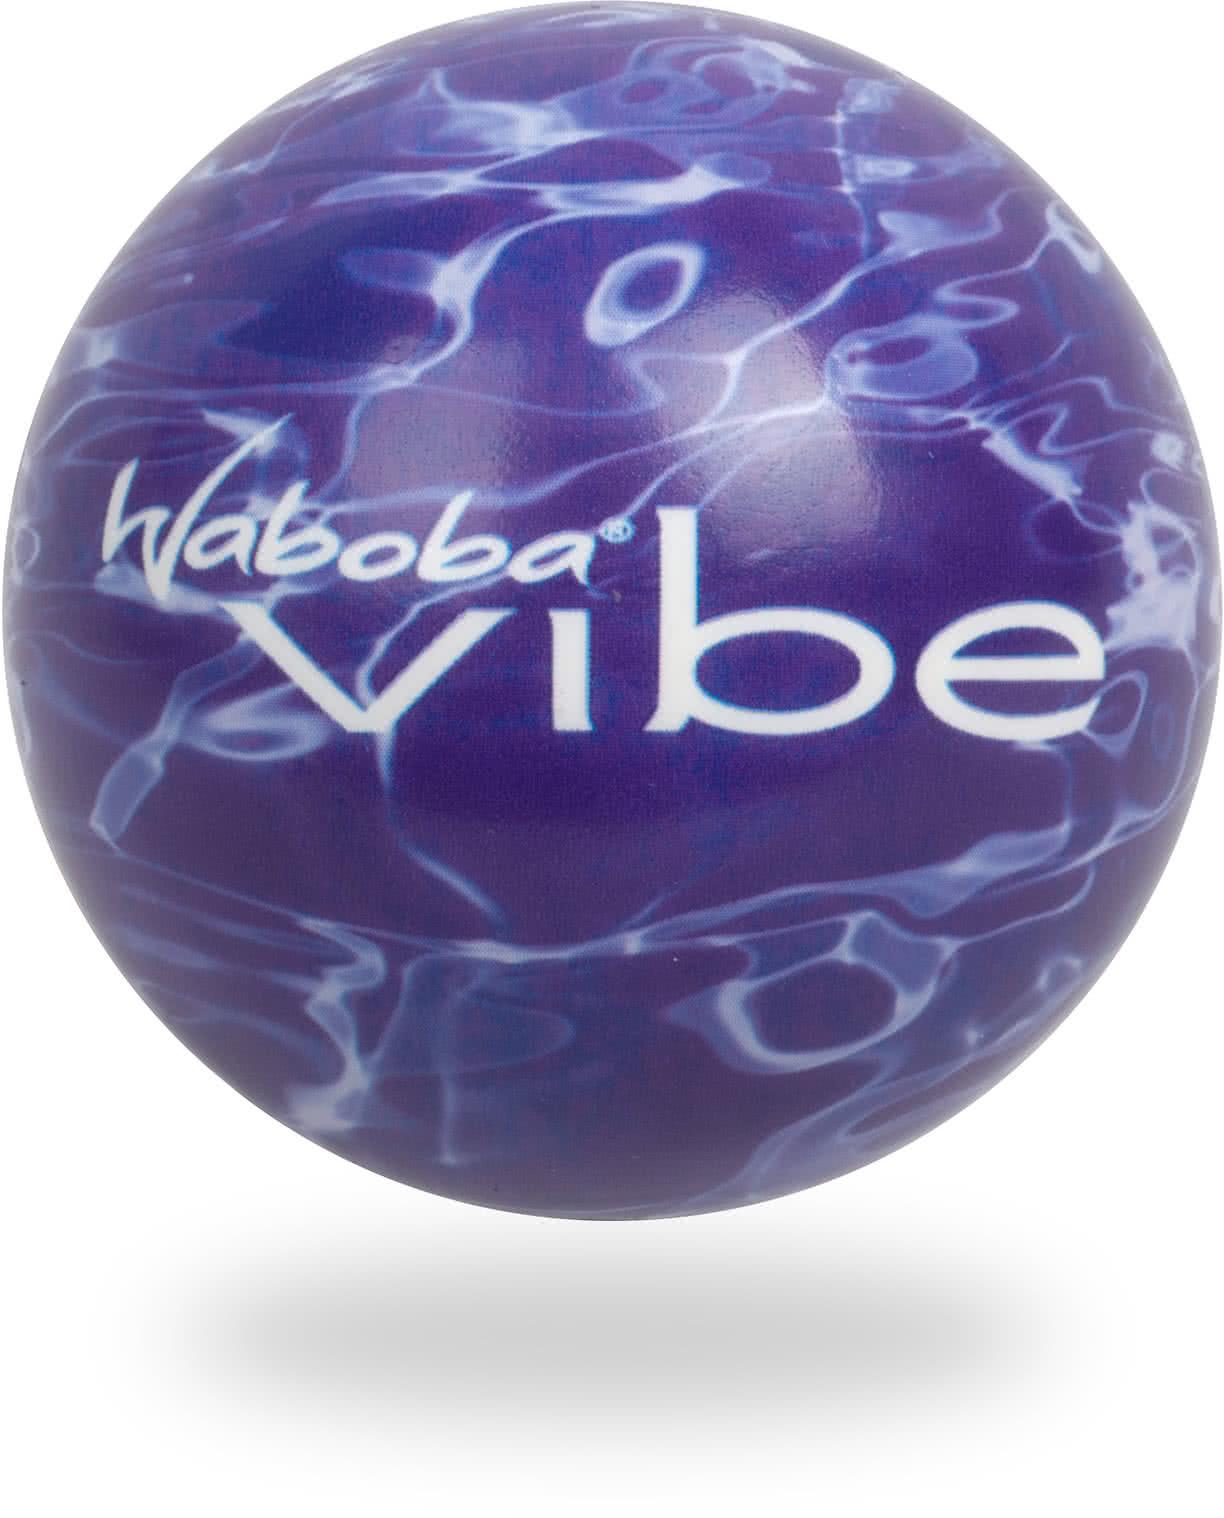 Waboba Vibe ball